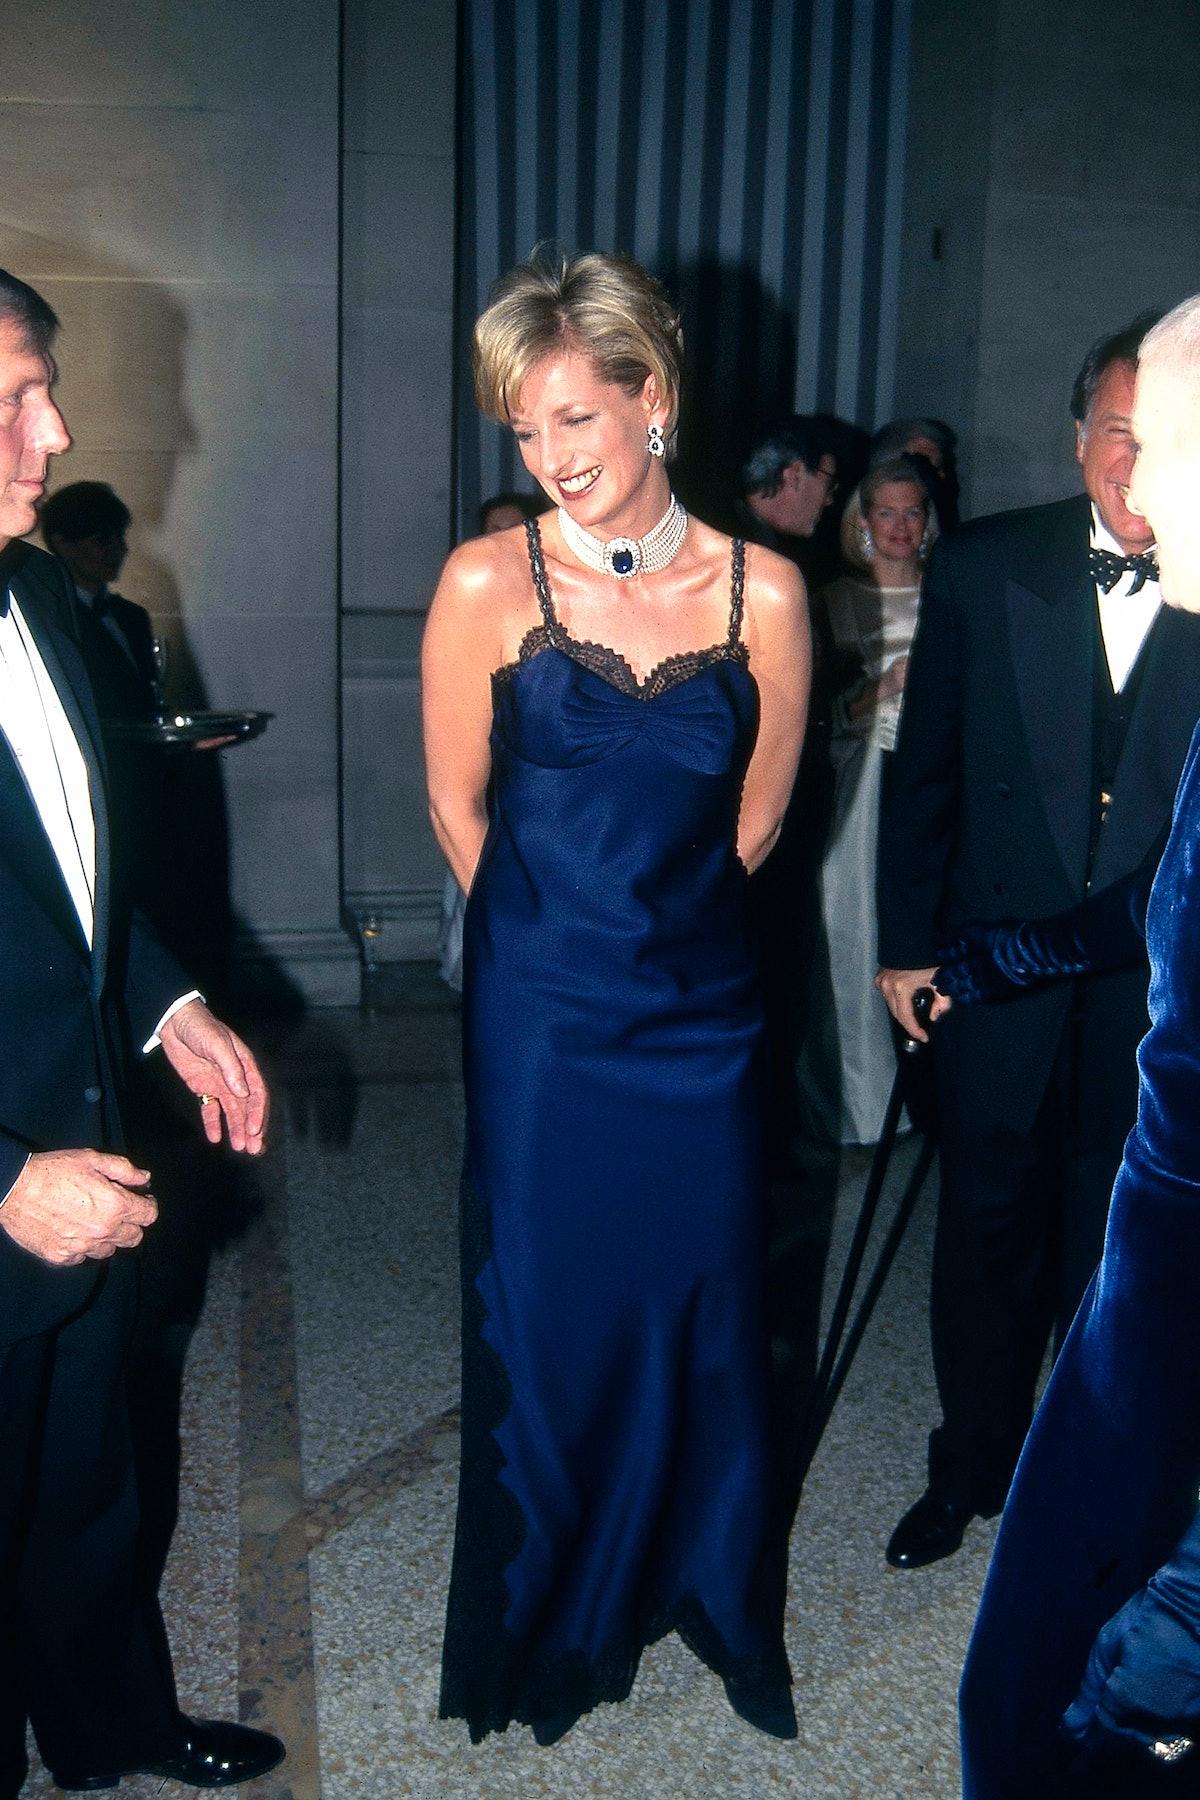 NEW YORK, NY - JANUARY 01: Princess Diana attends Met Gala at Metropolitan Museum of Art on January ...